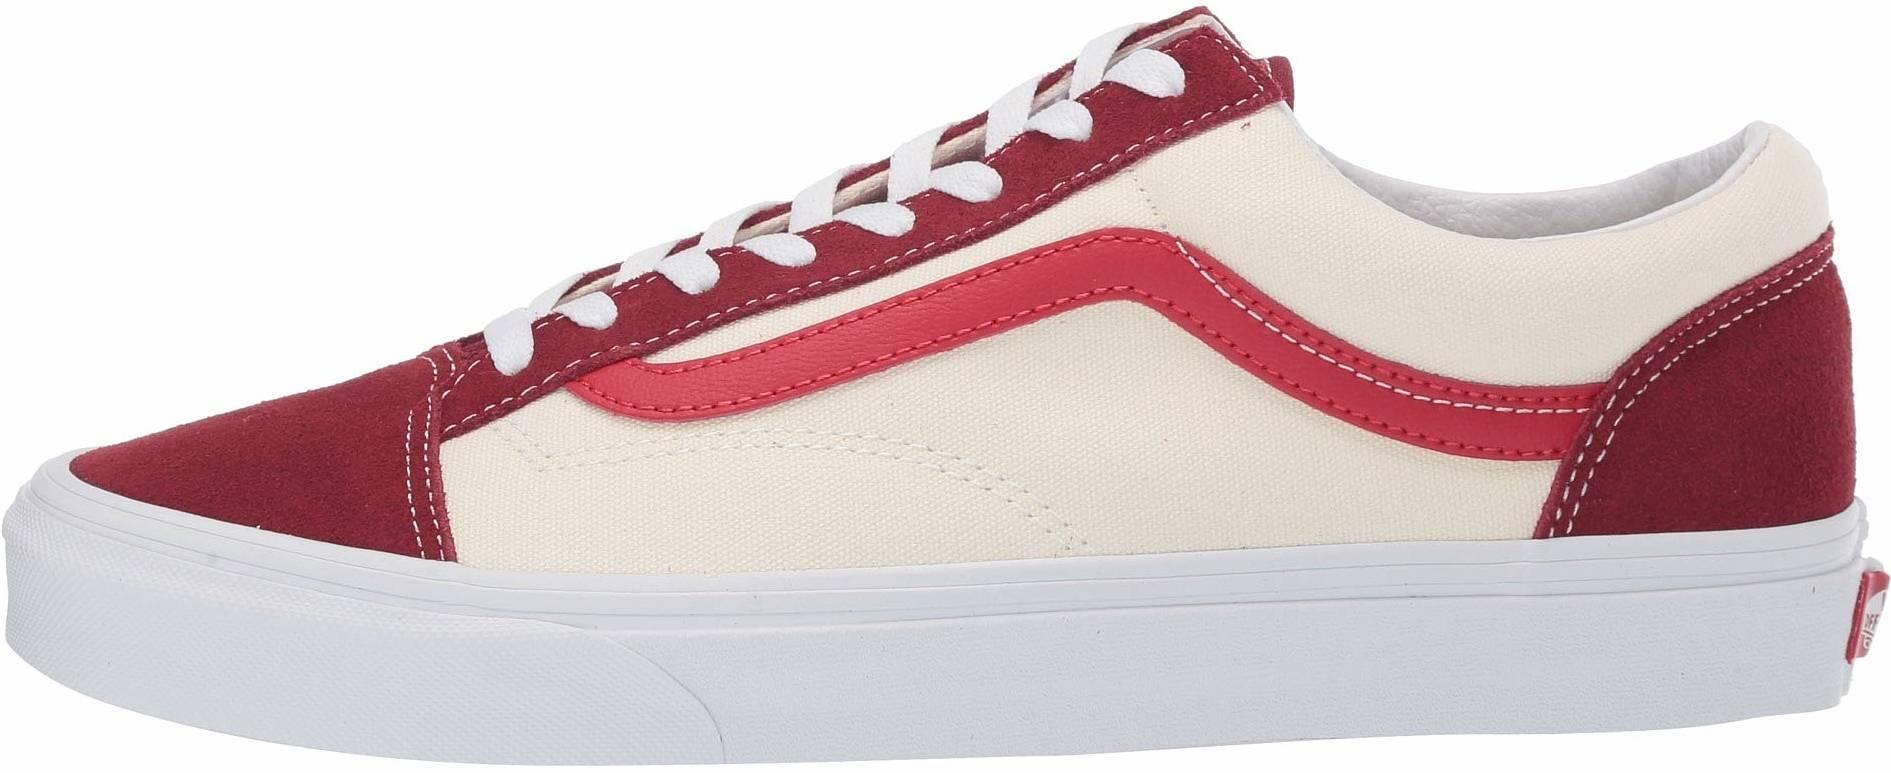 Vans Retro Sport Style 36 sneakers in red orange (only $44 ...